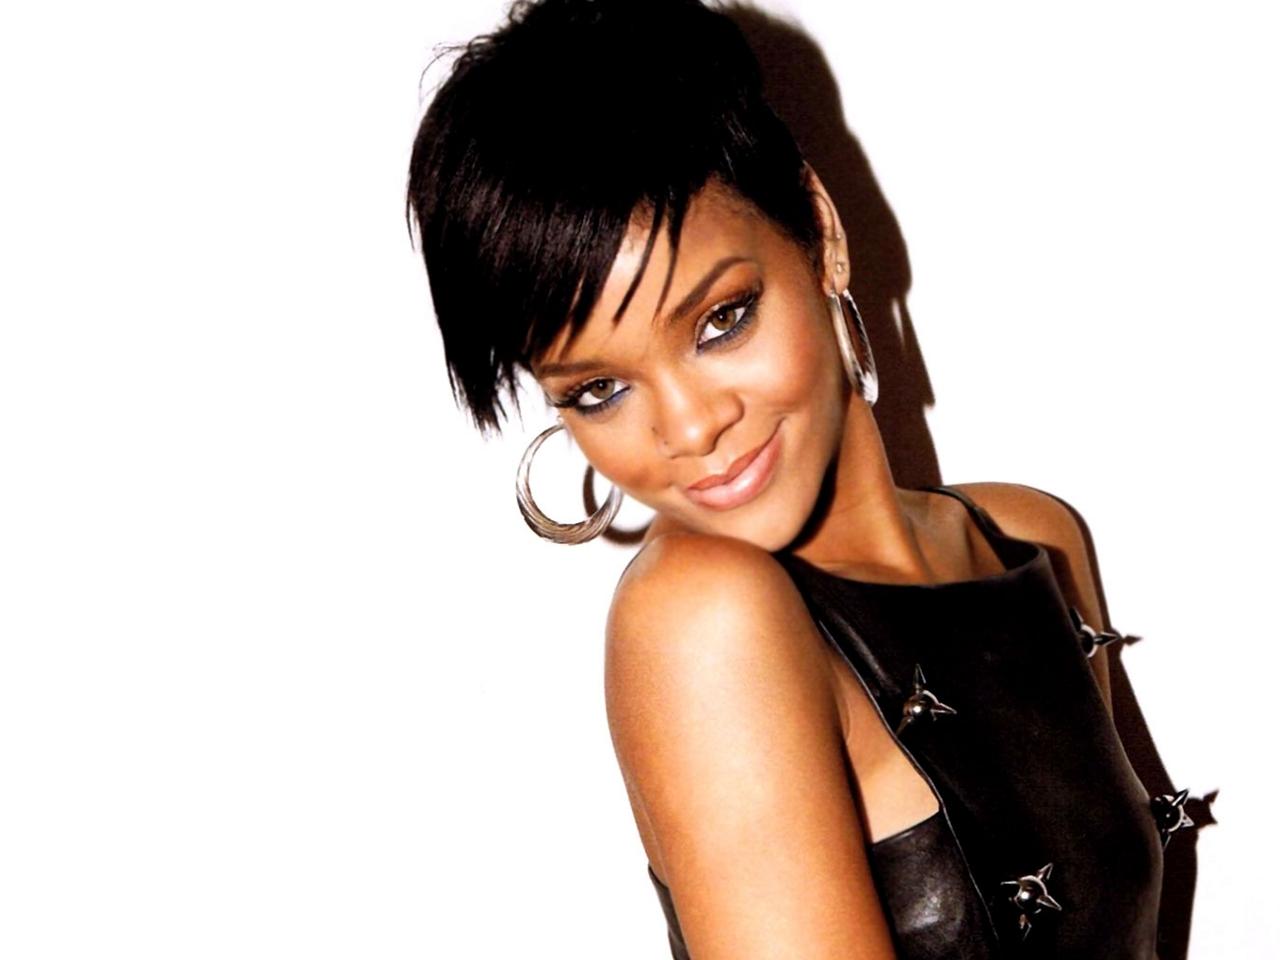 Rihanna rihanna luire magazine Rihanna